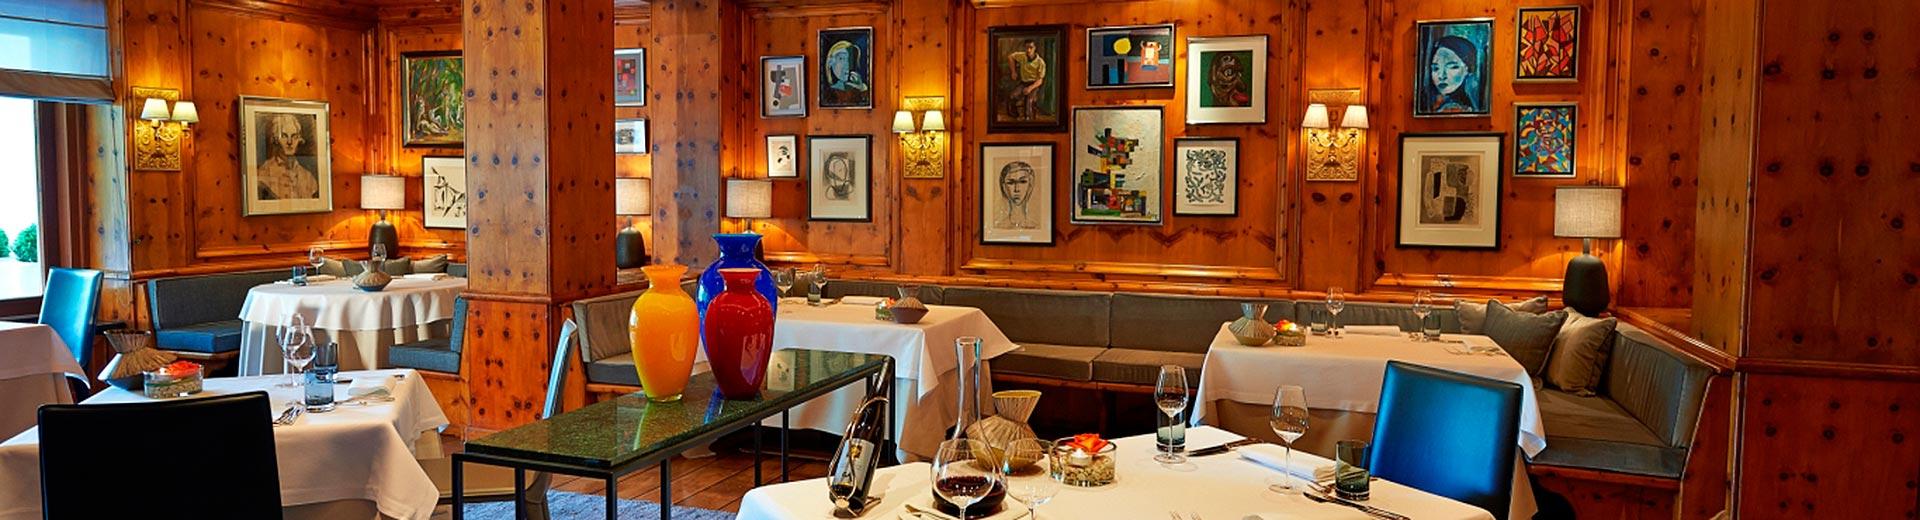 Wine & Dine - Das Taste Menü